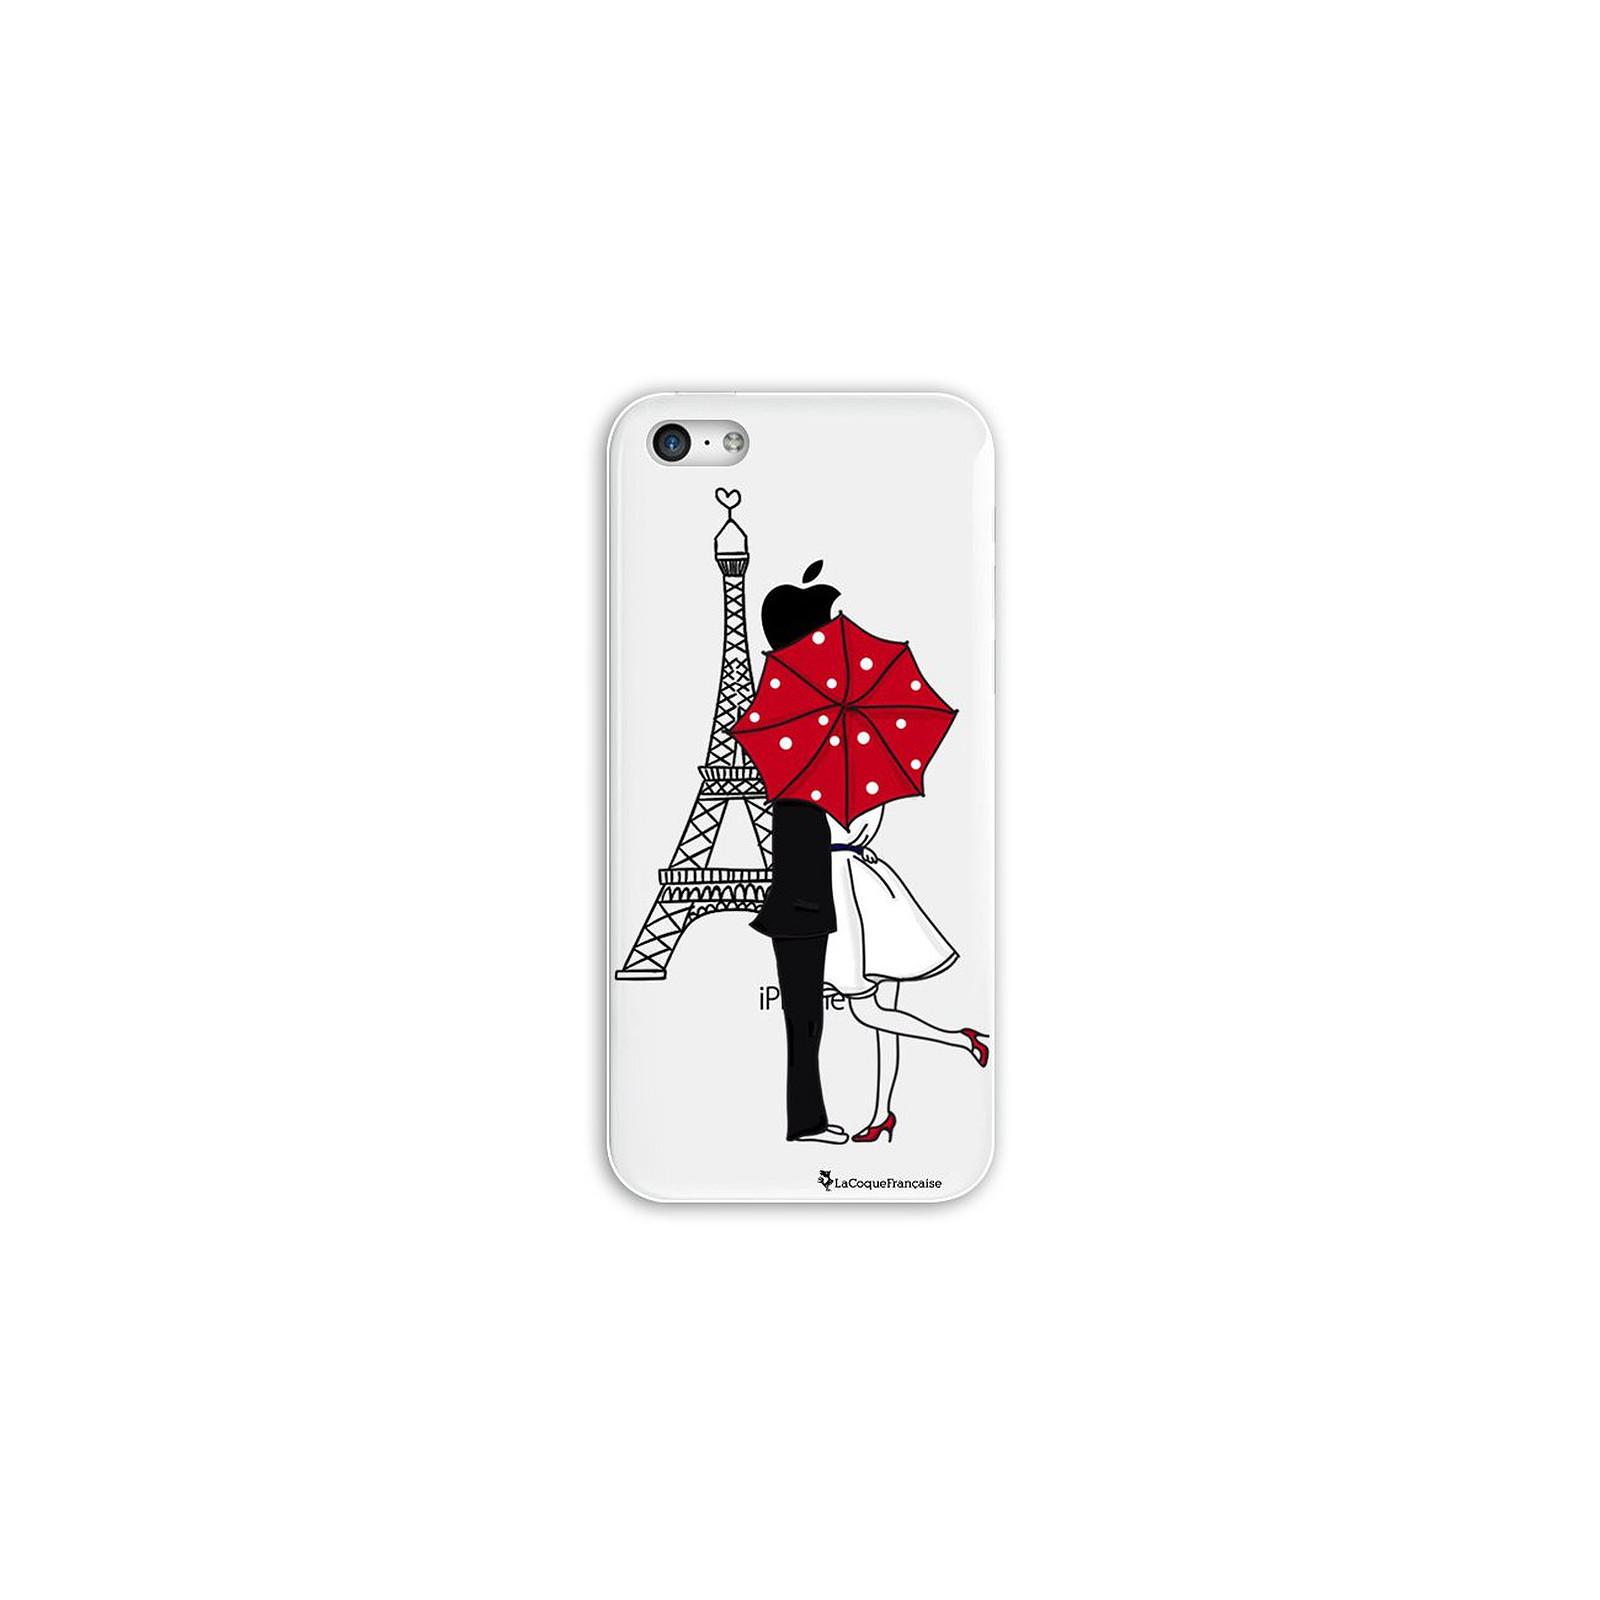 LA COQUE FRANCAISE Coque iPhone 5C rigide transparente Amour à Paris Dessin